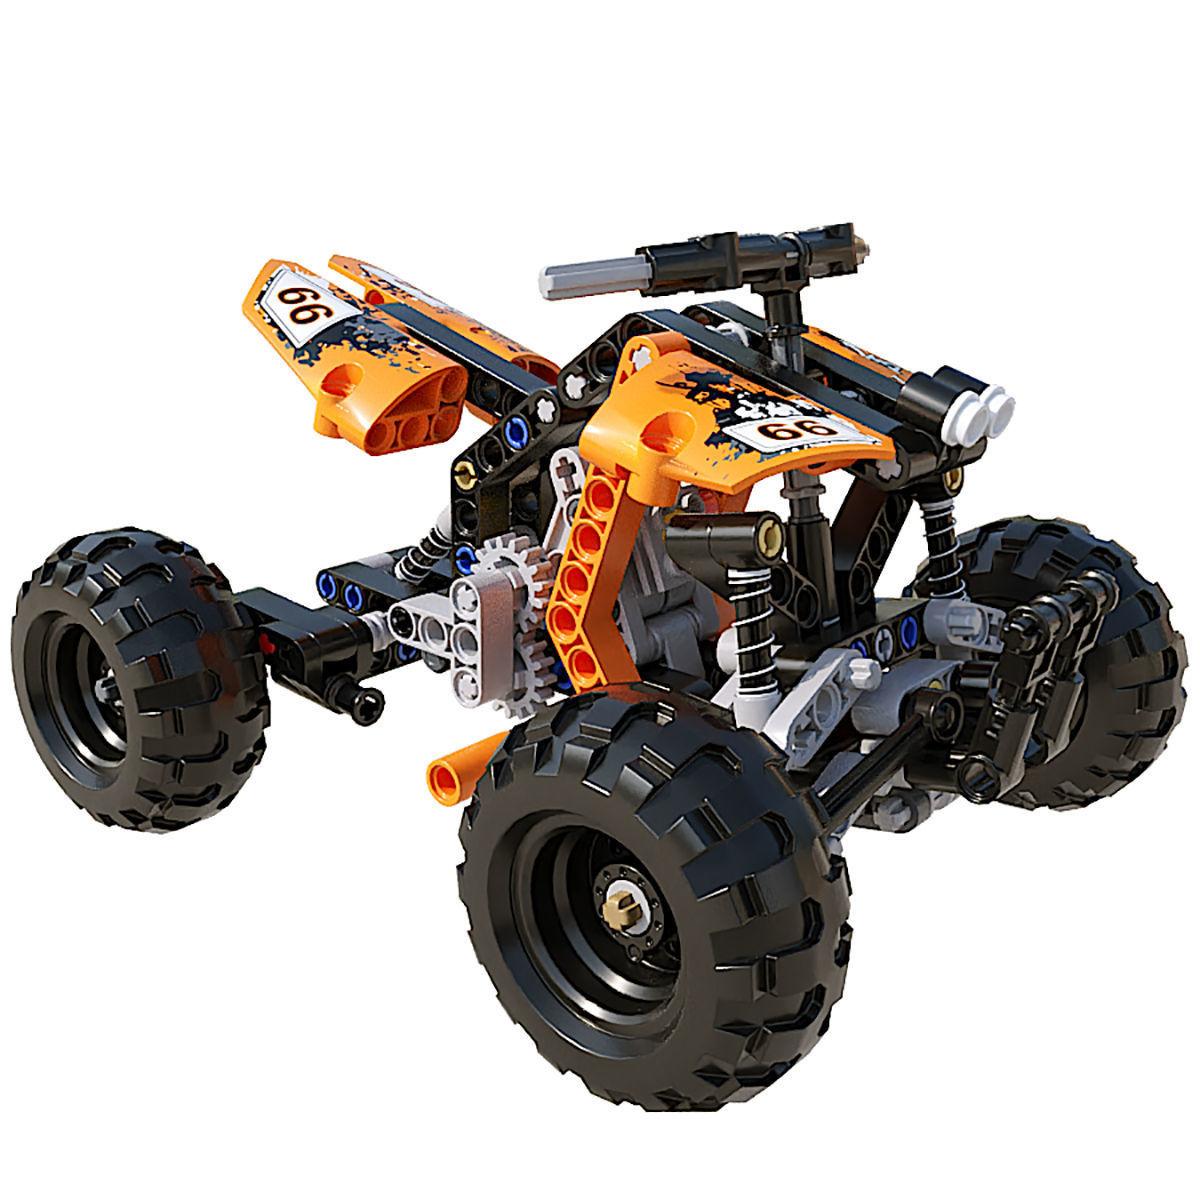 LEGO Quad Bike 3D model | CGTrader